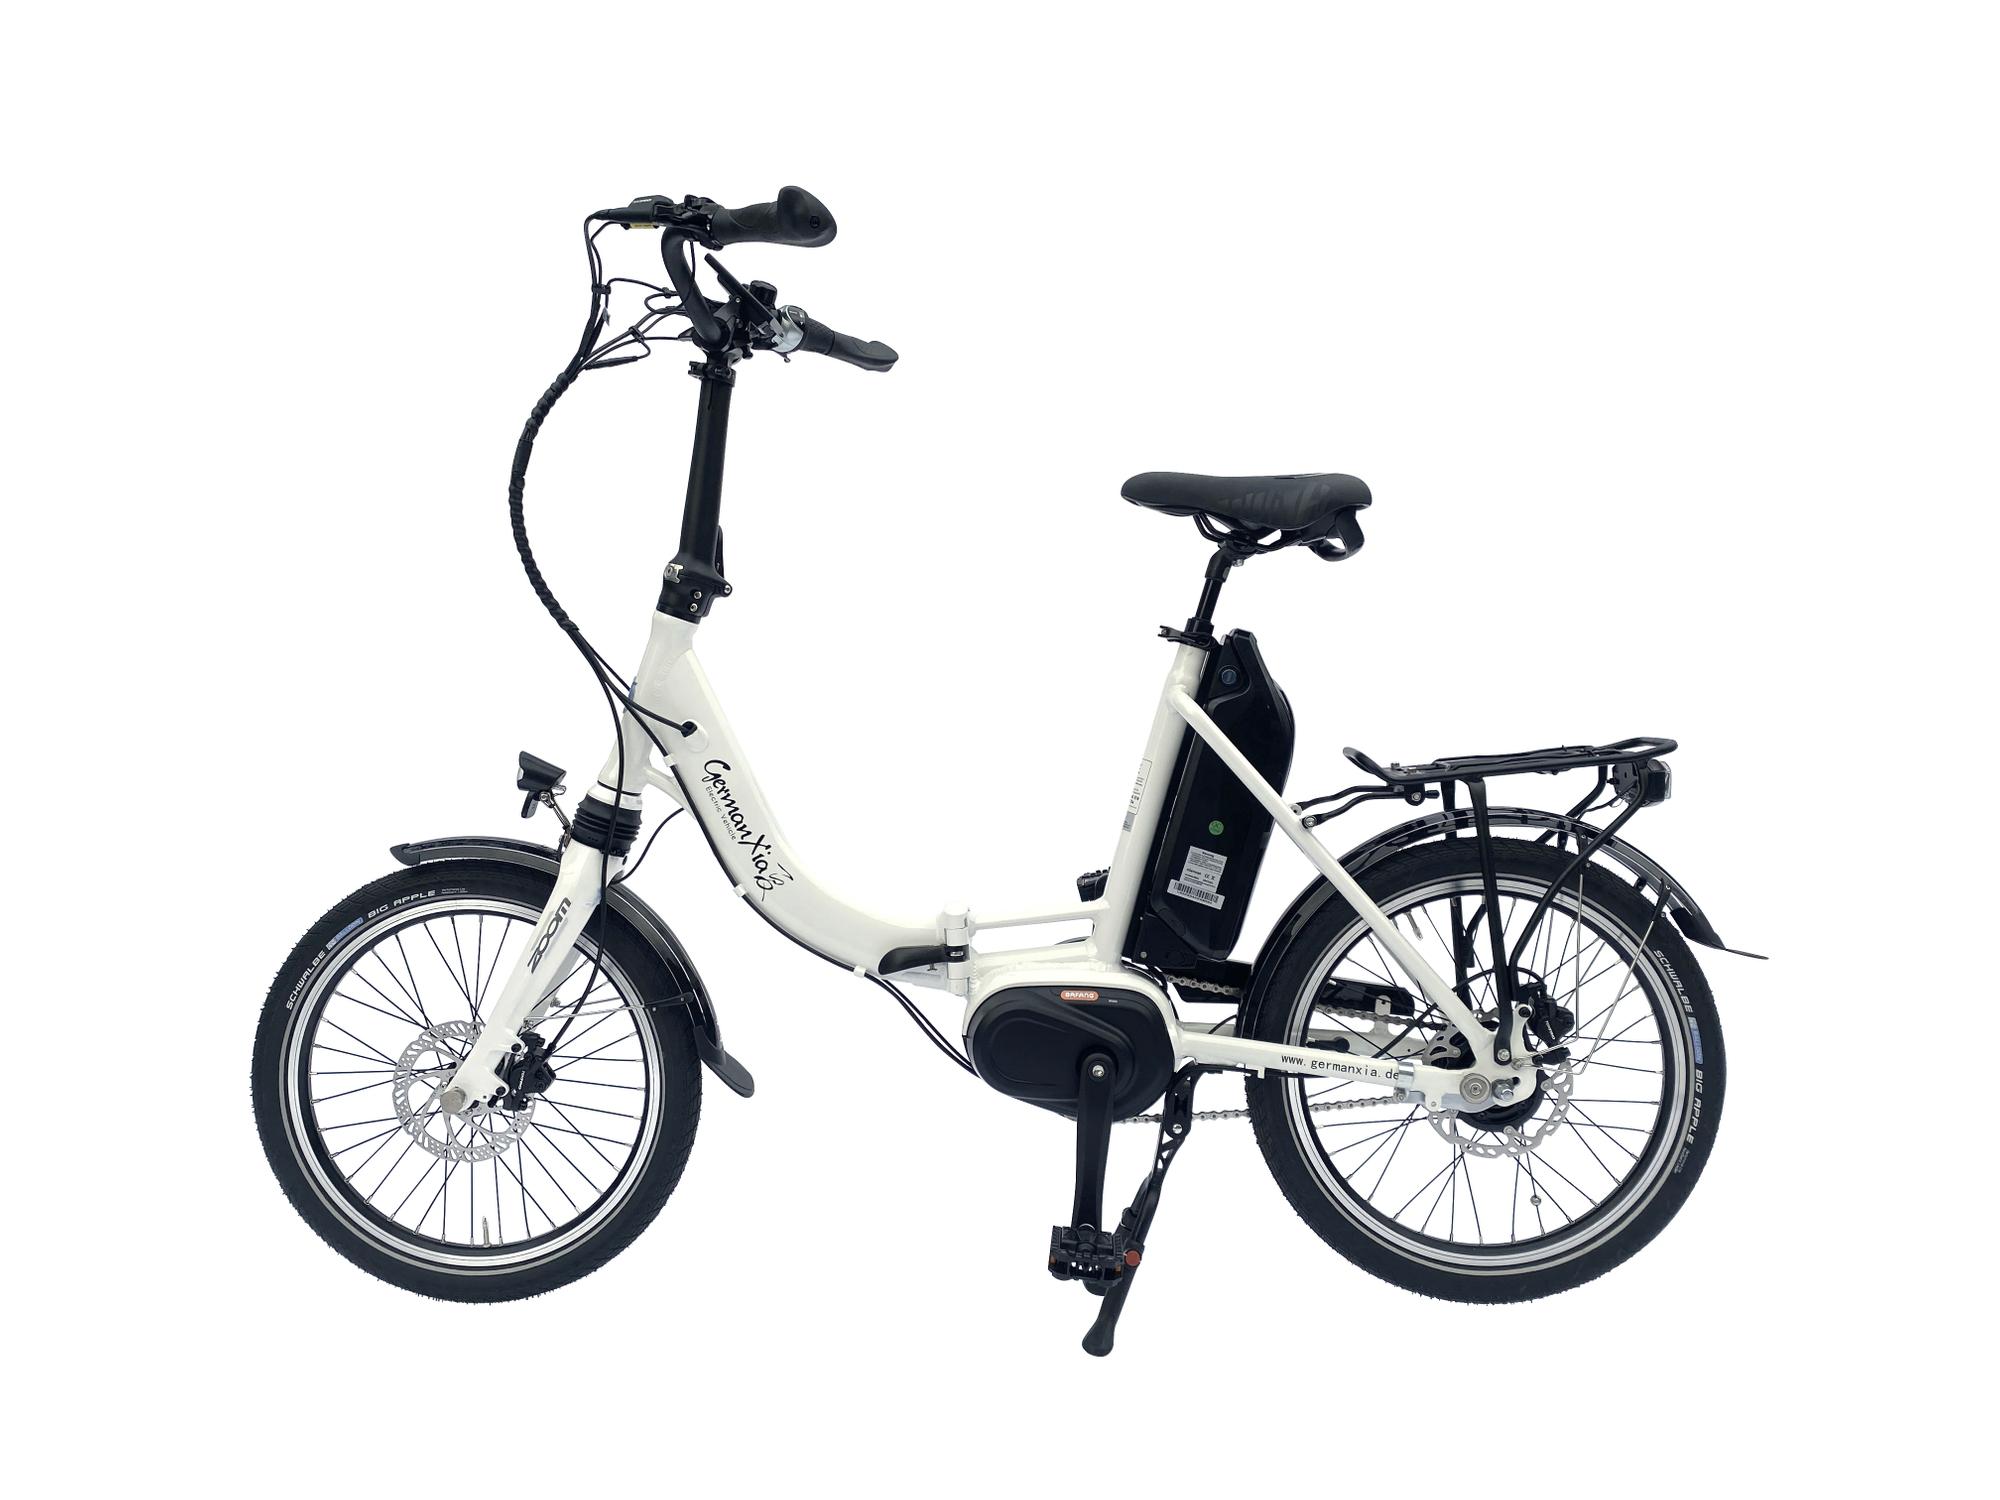 E-Bike Klapprad Mobilemaster Offroad CM 8G Bafang Mittelmotor 80Nm mit Gates Carbon Riemen